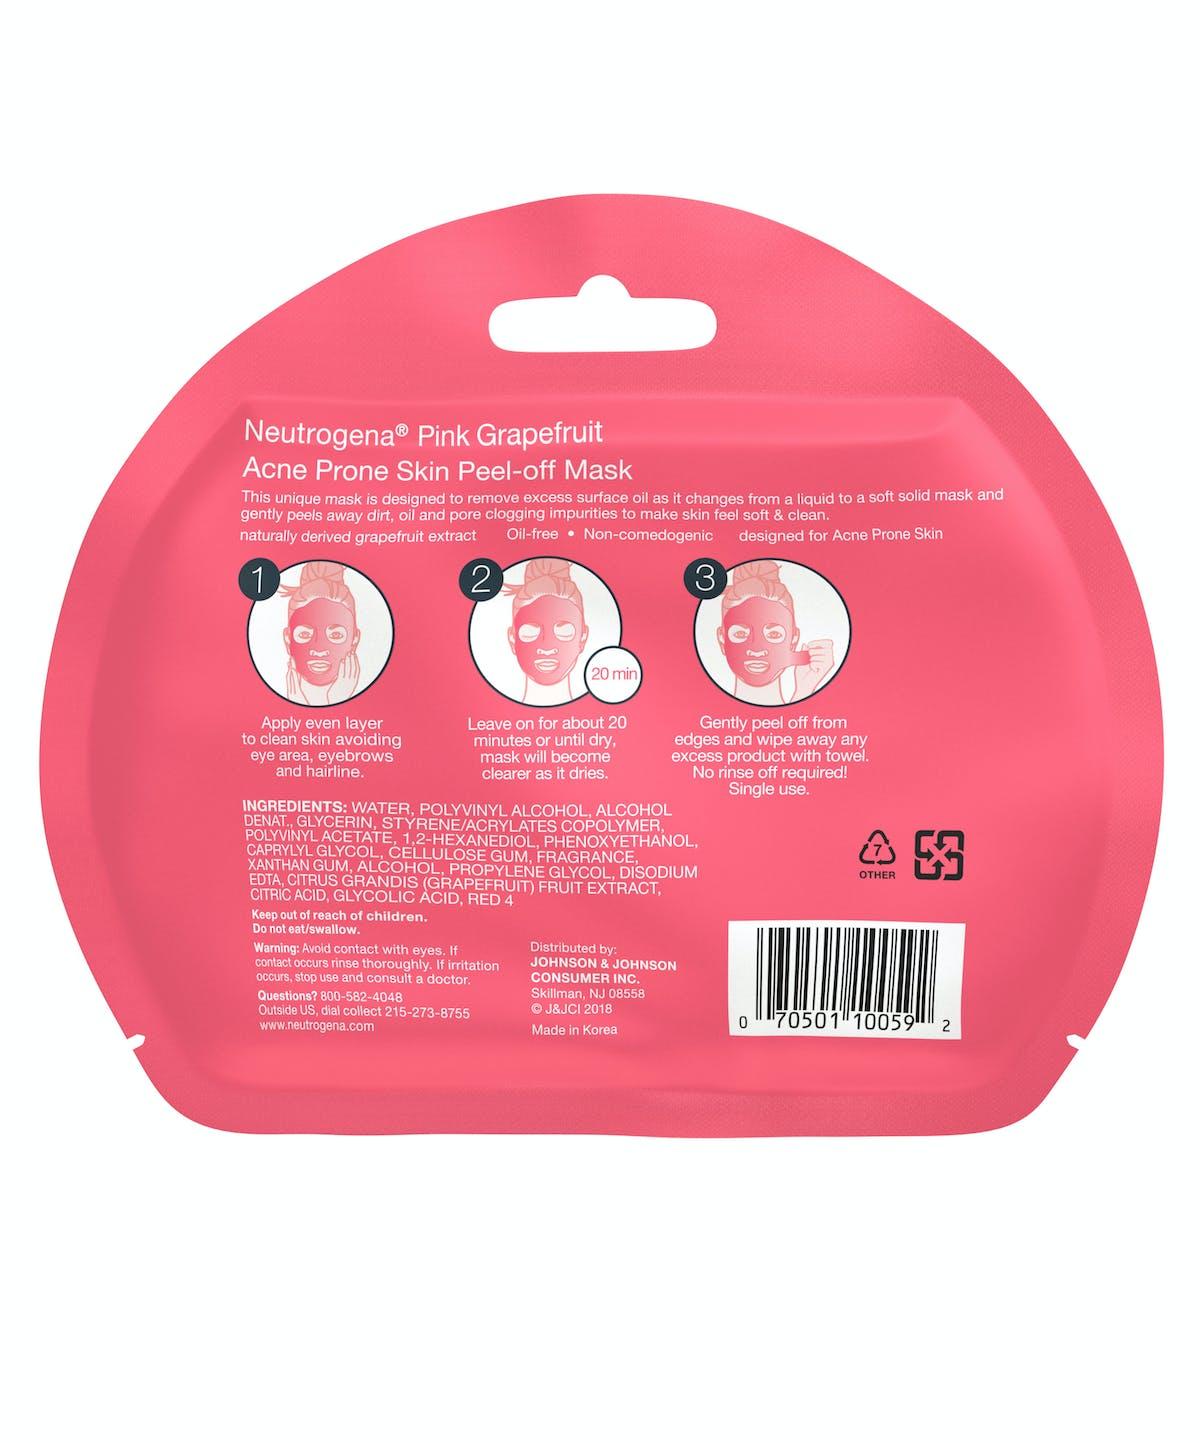 Pink Grapefruit Peel-Off Face Mask for Acne-Prone Skin | Neutrogena®